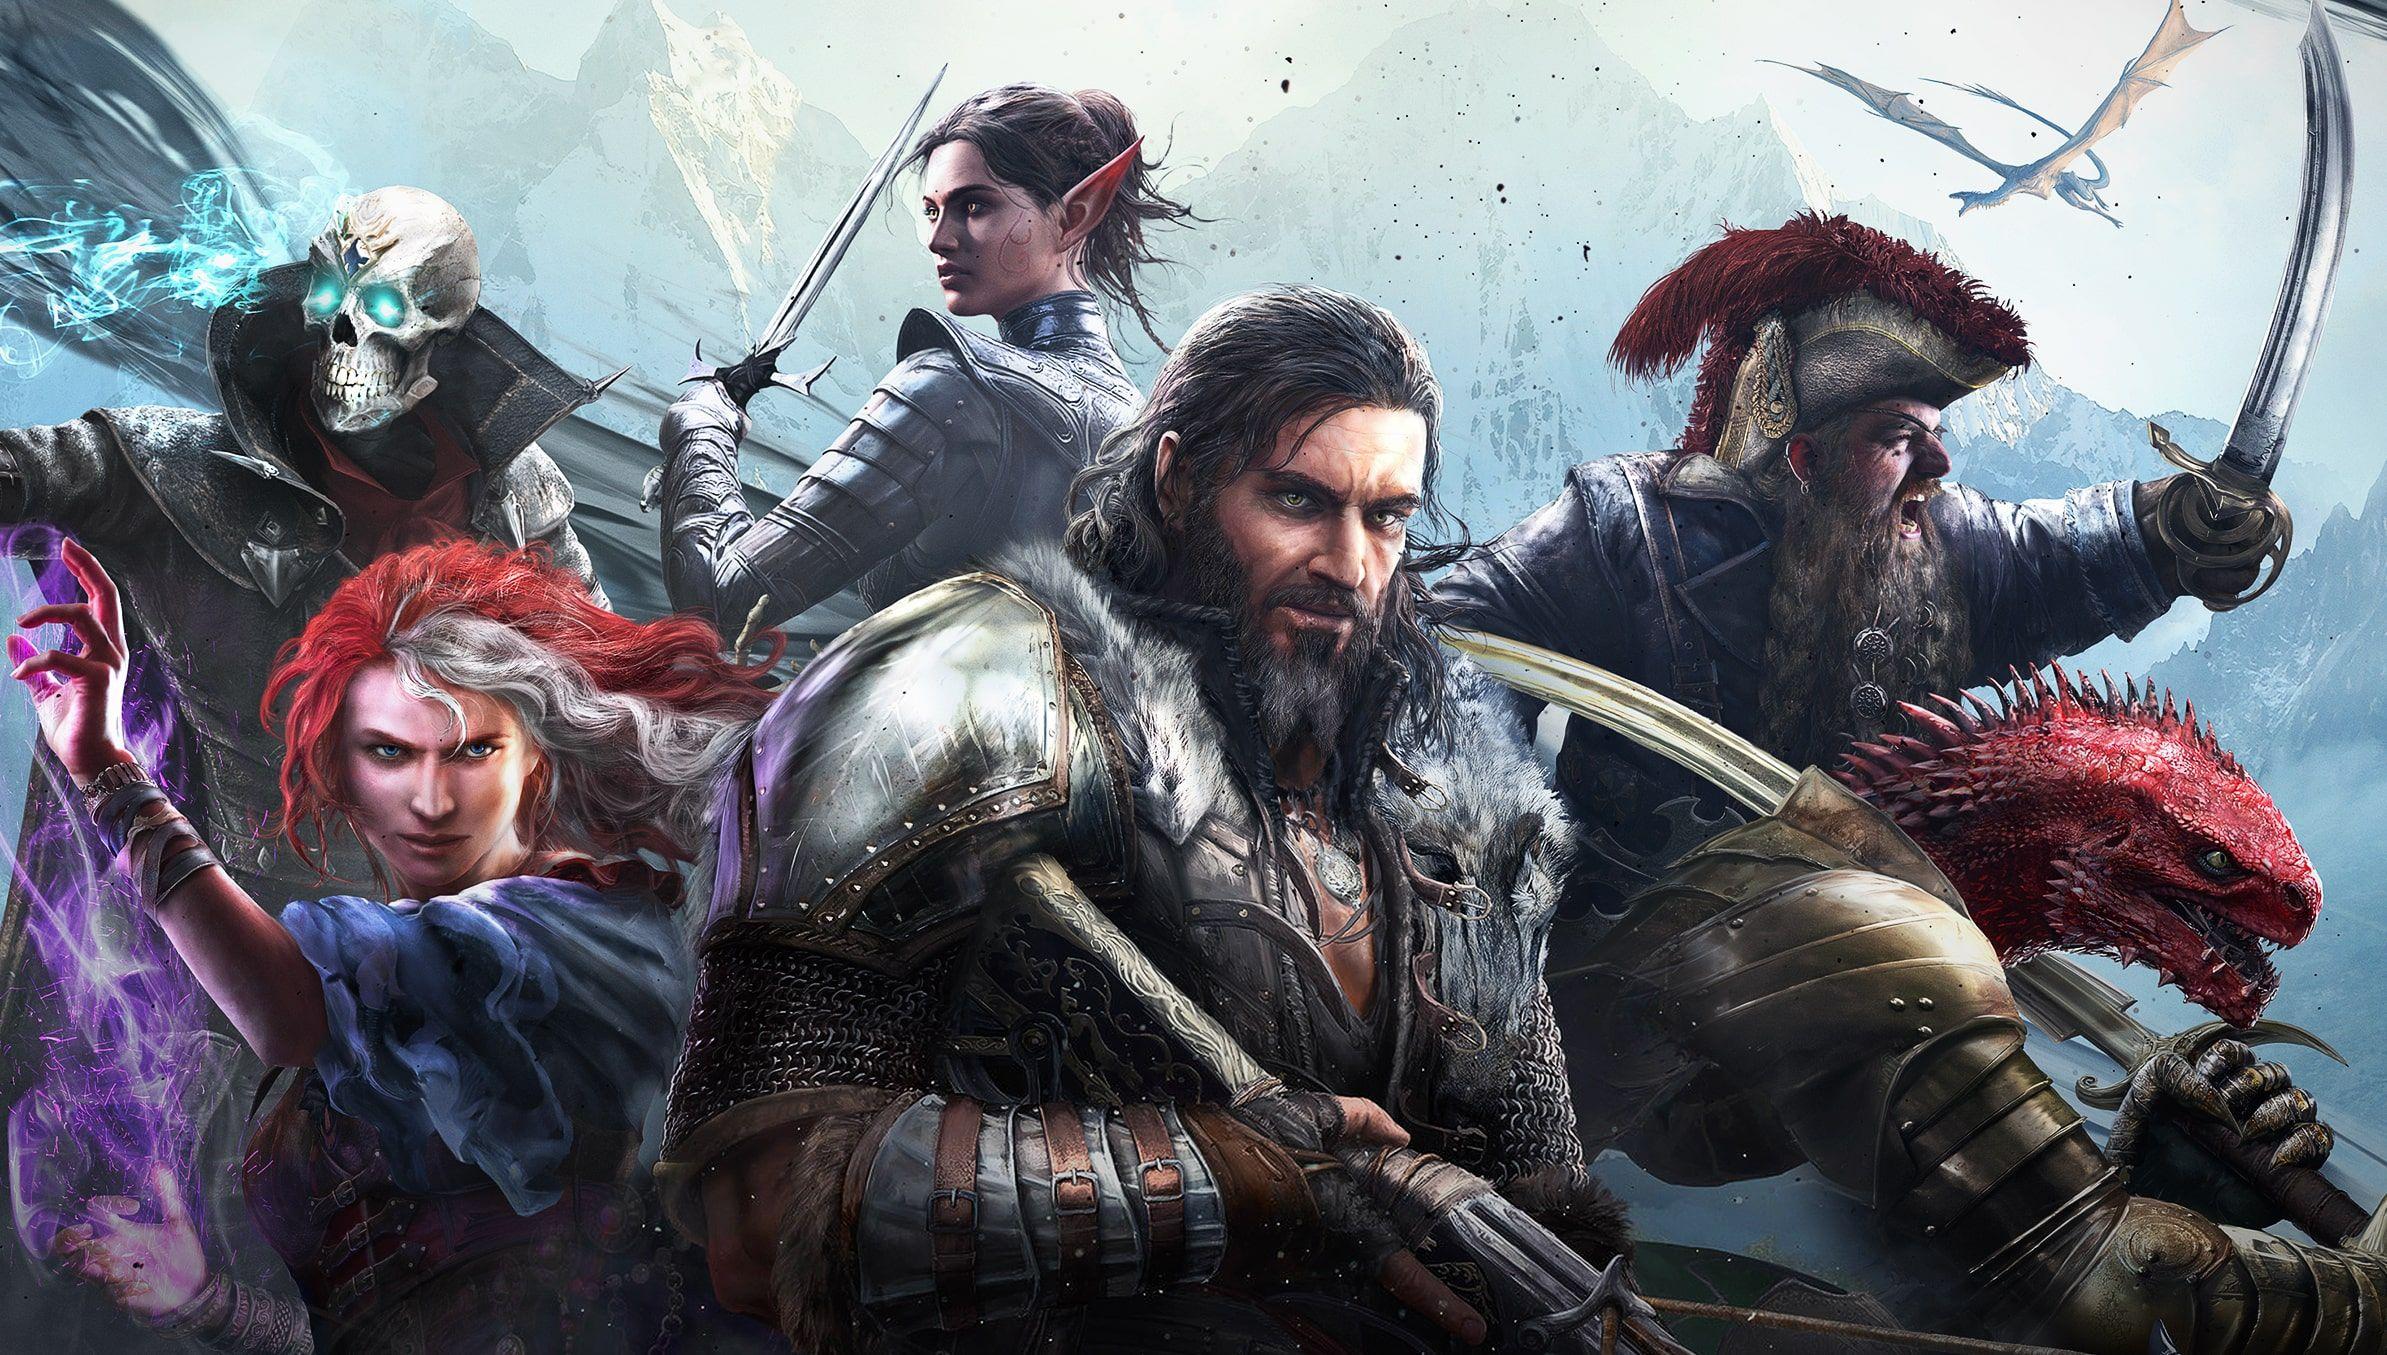 The best RPGs on PC in 2019 | Rock Paper Shotgun